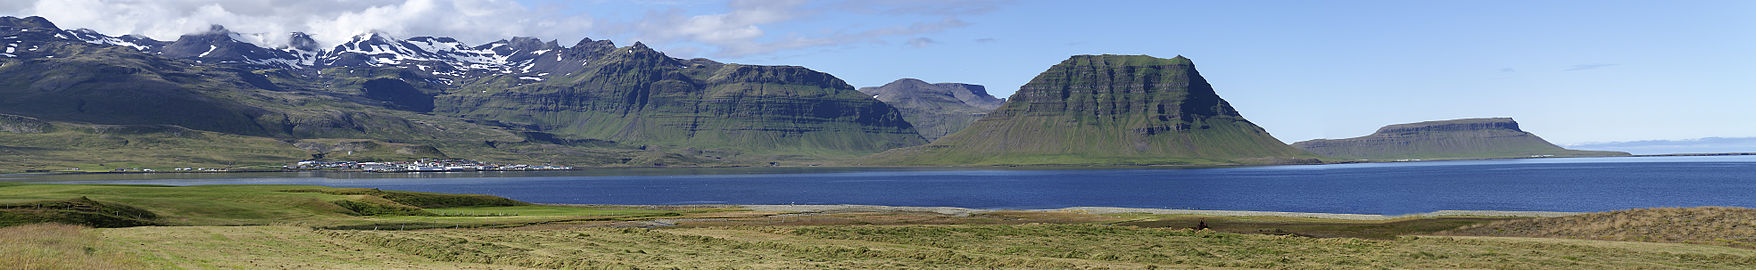 Grundarfjördur Panorama-pjt1.jpg